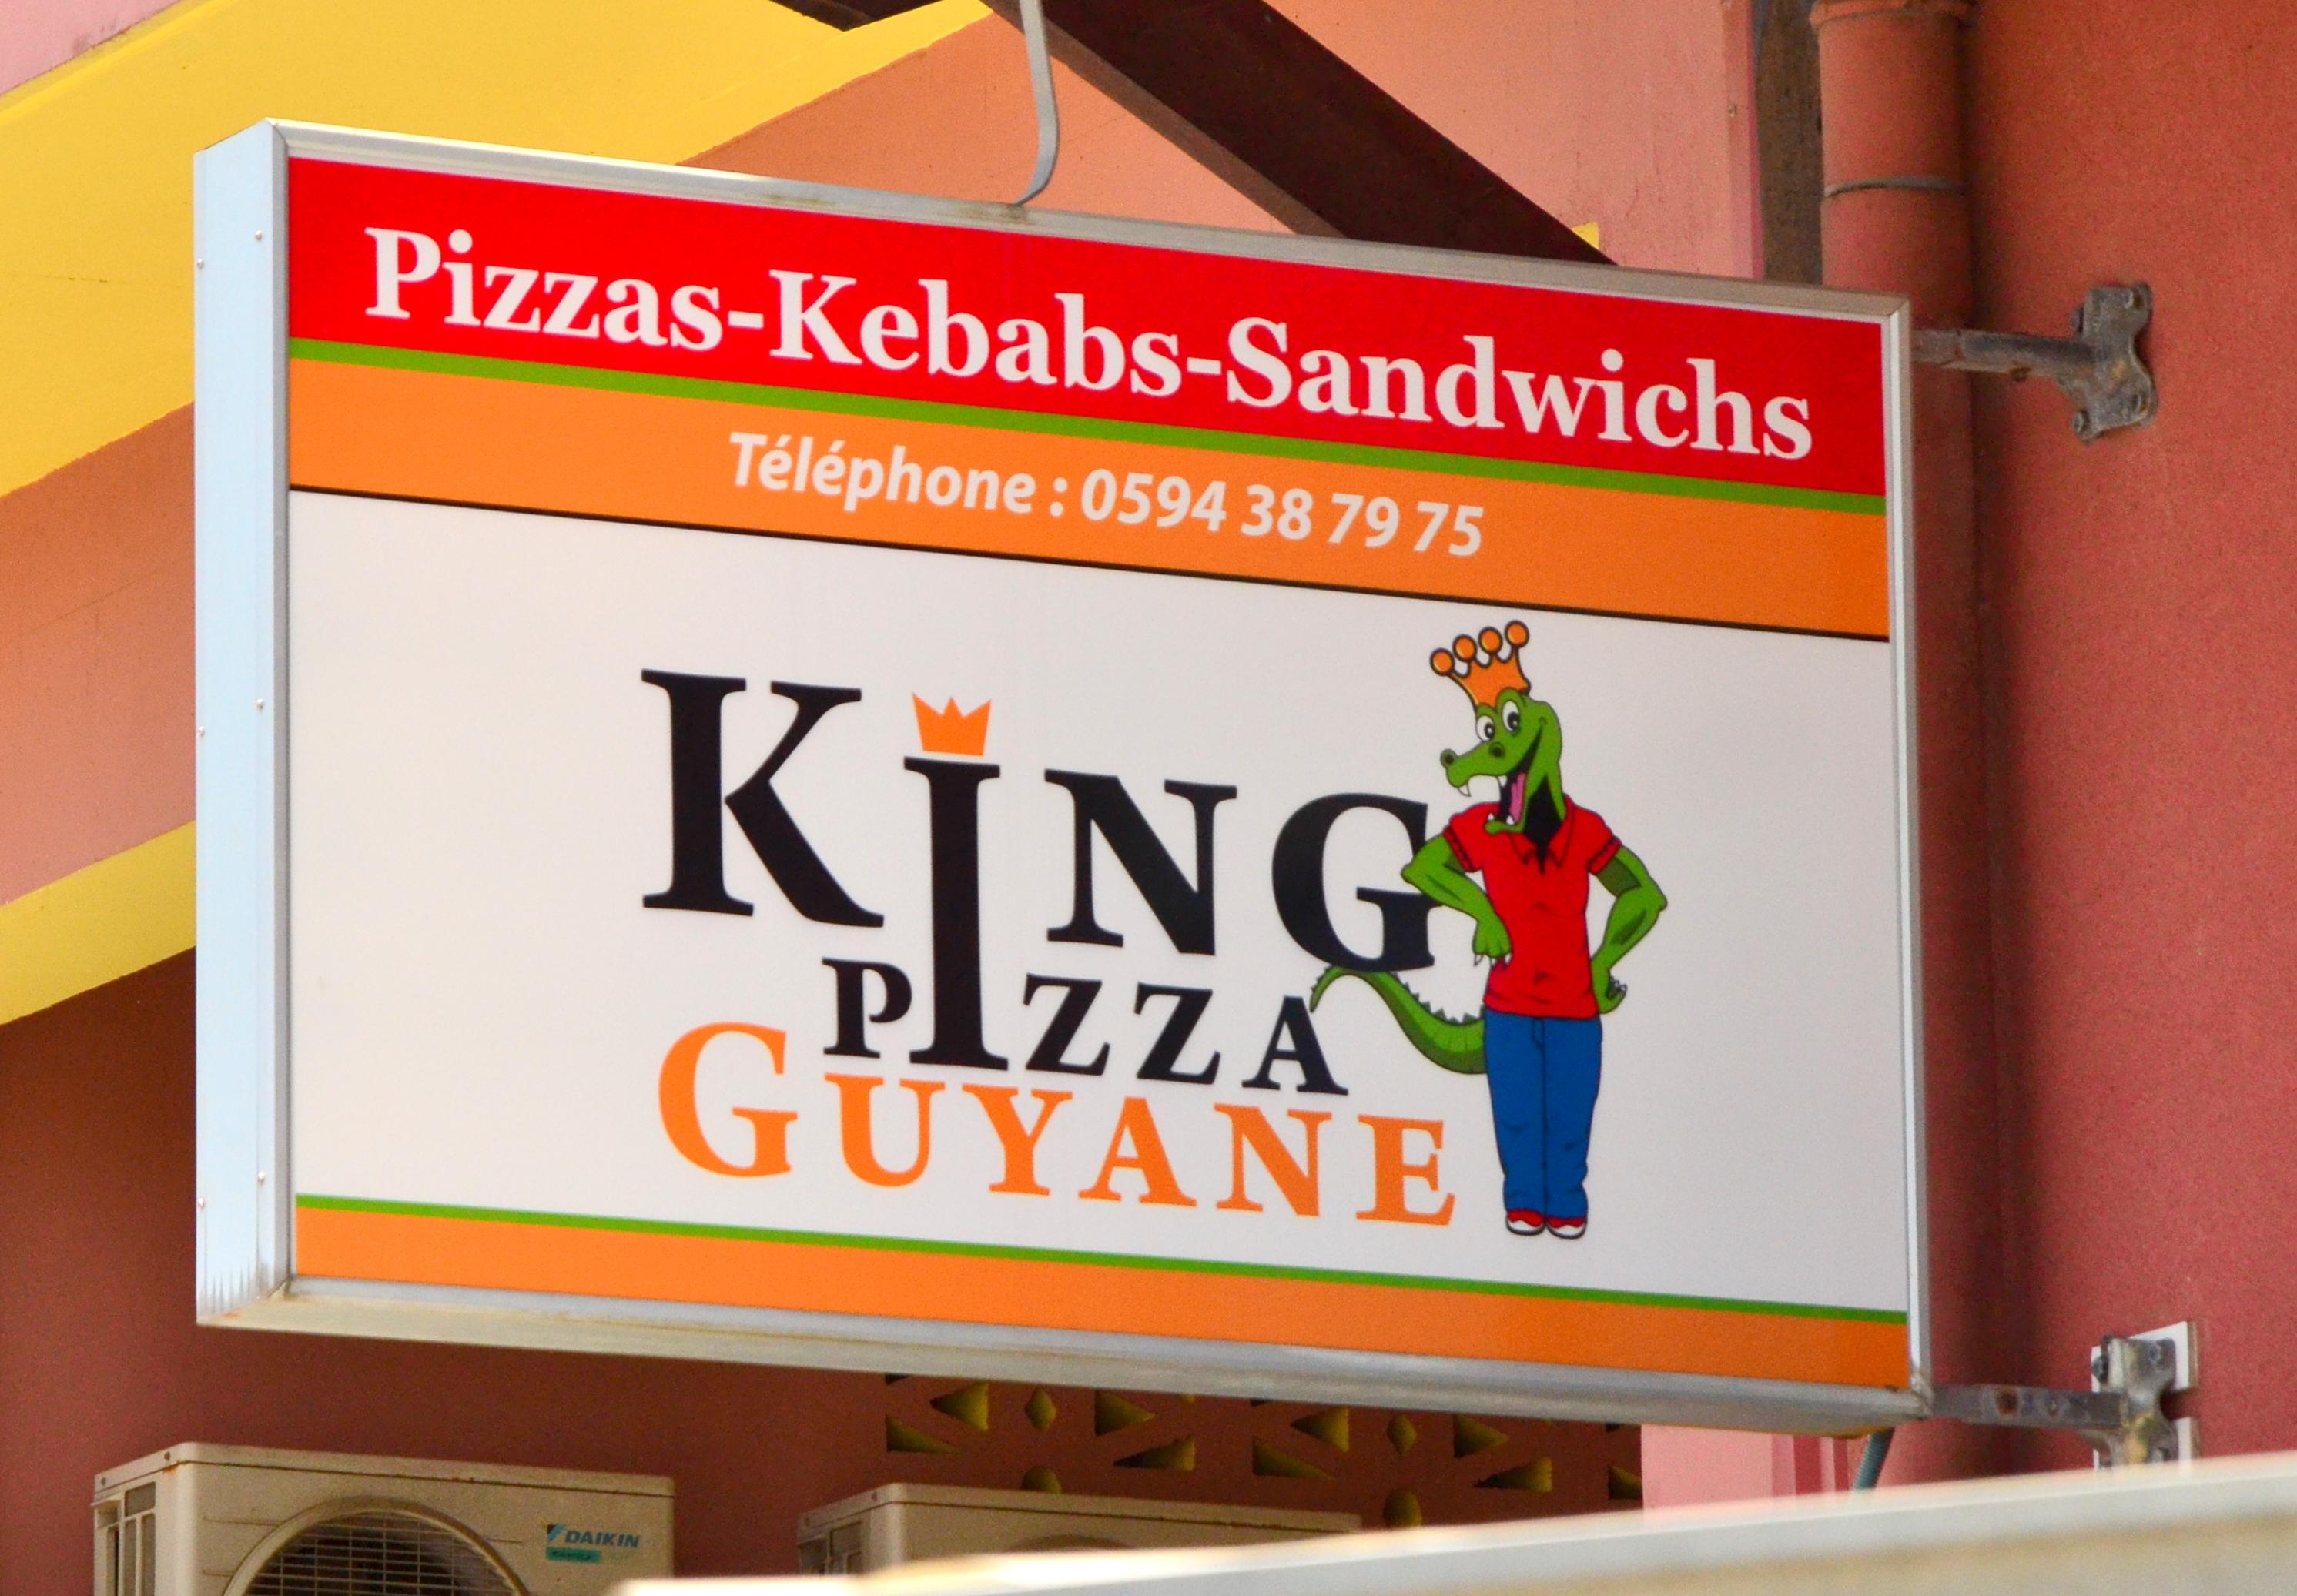 King pizza guyane à Cayenne